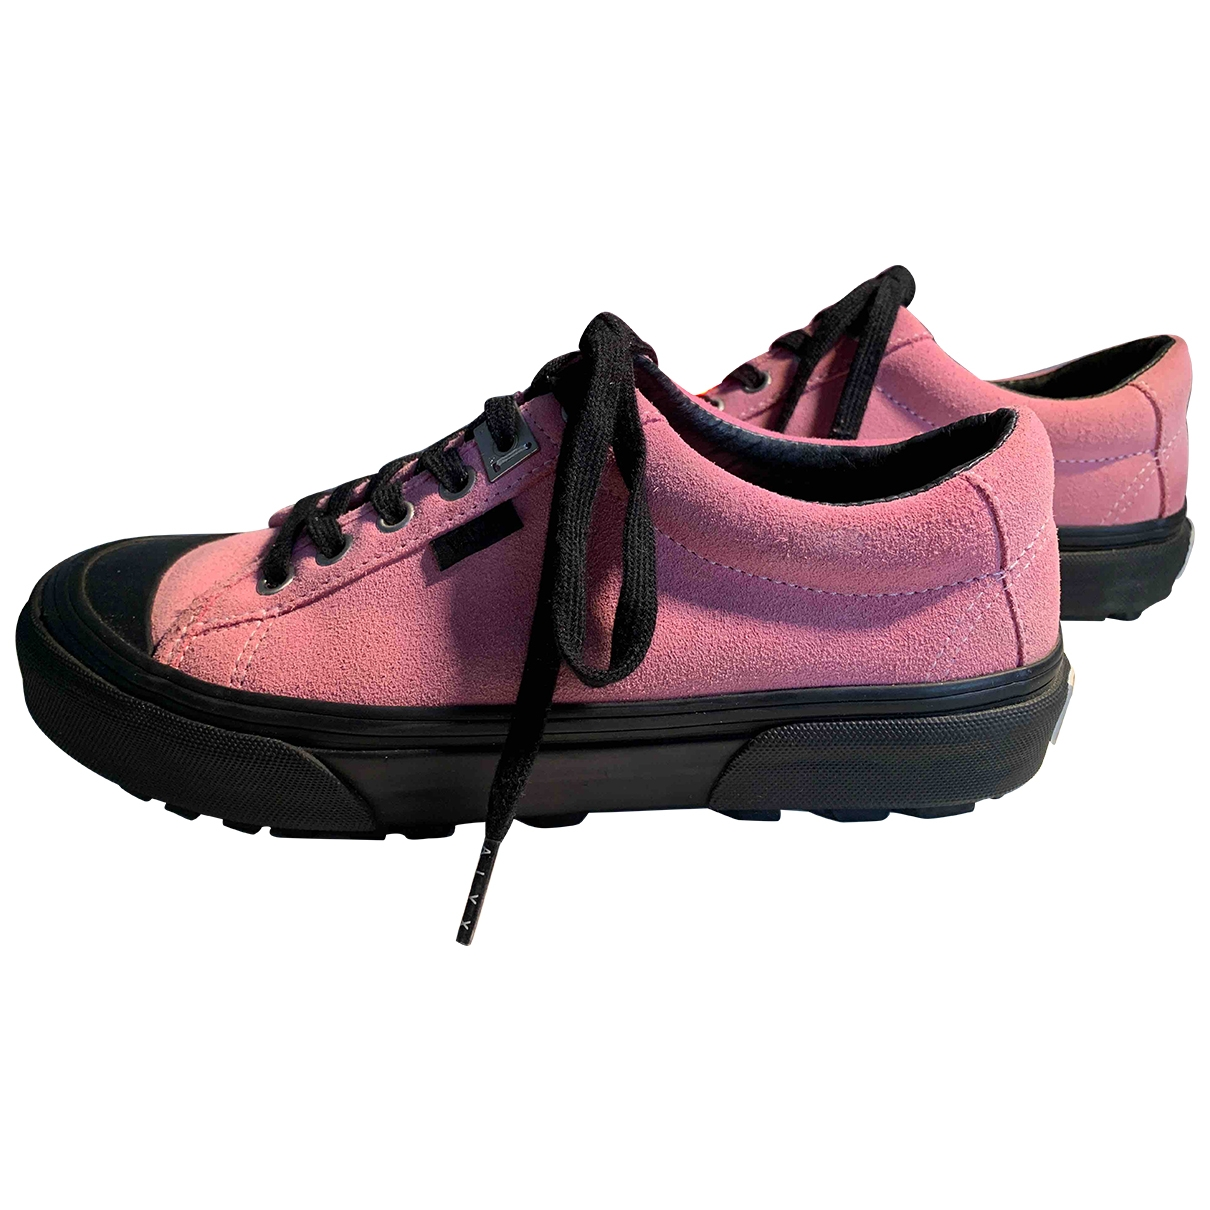 Vans - Baskets   pour femme en suede - rose